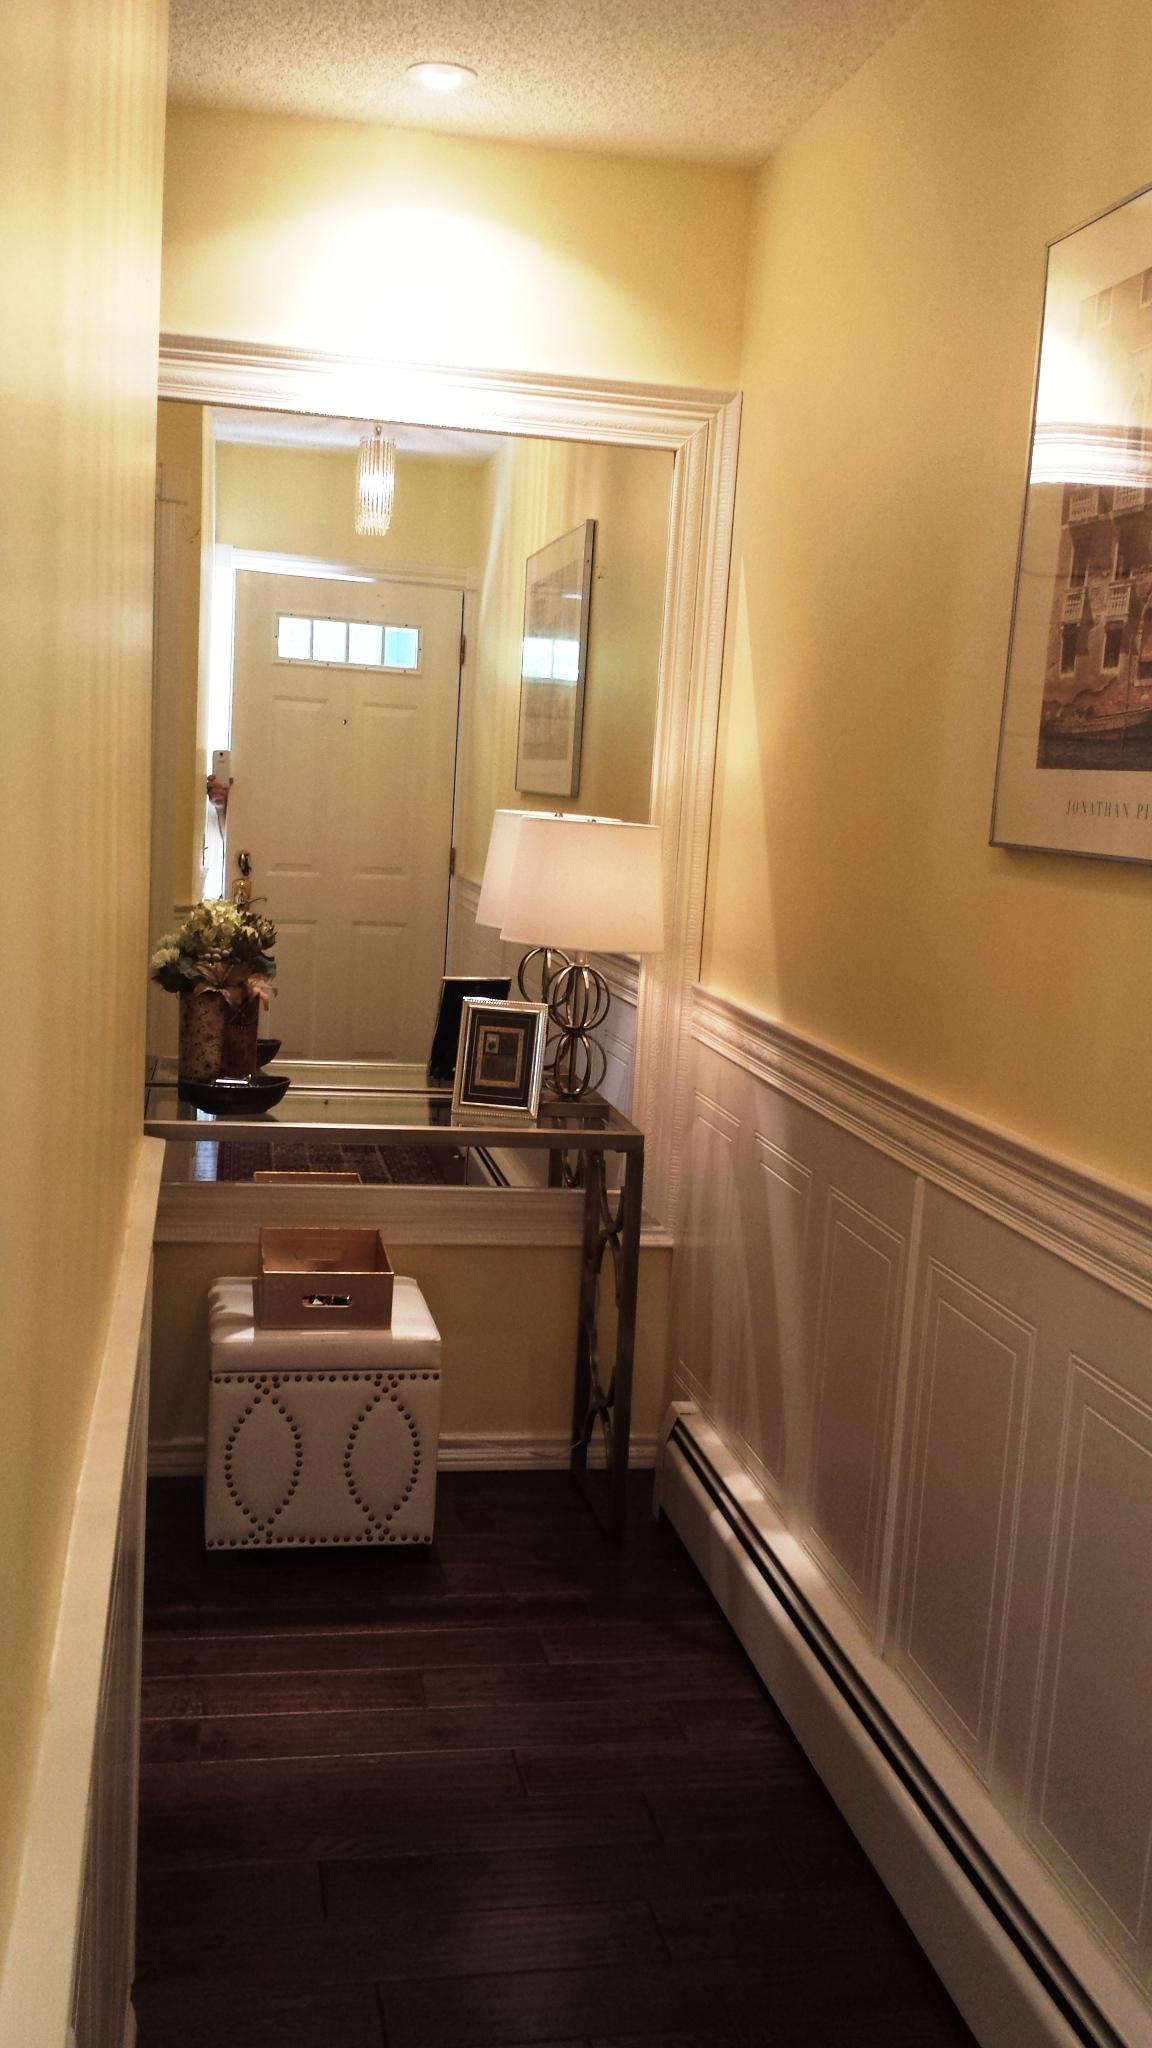 Unit 204 - Hallway 1